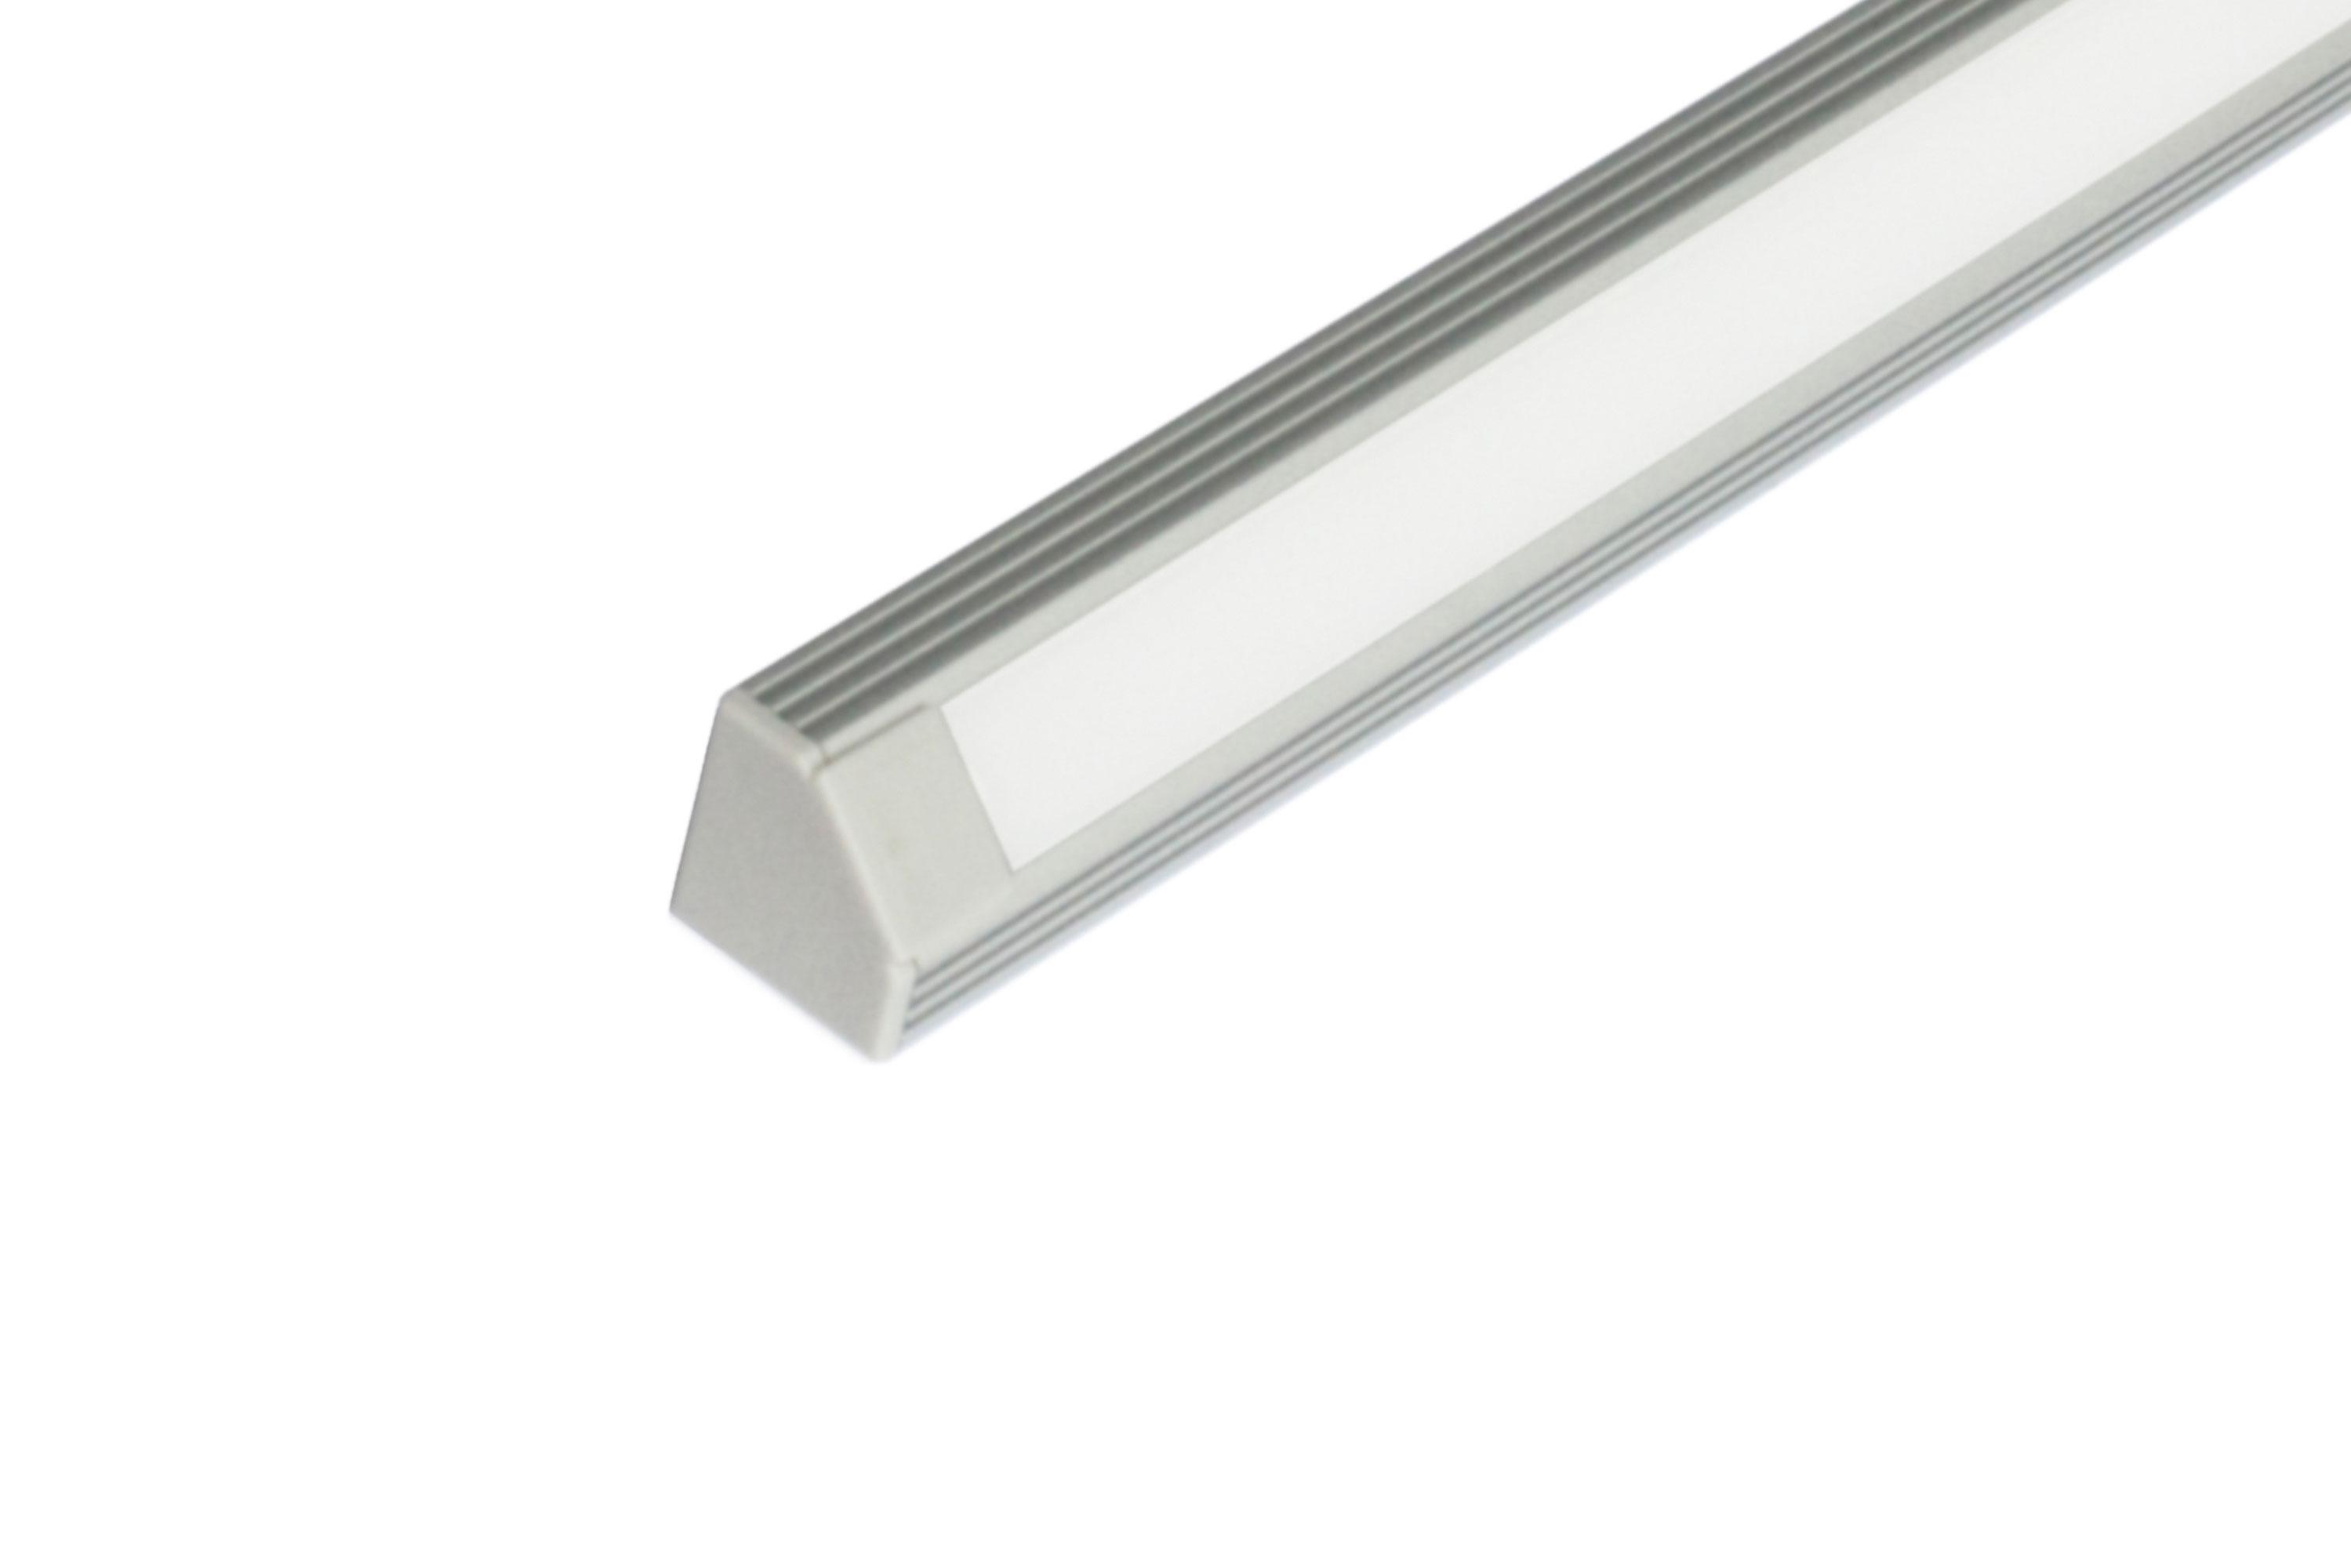 lightline-eko-trilight-1